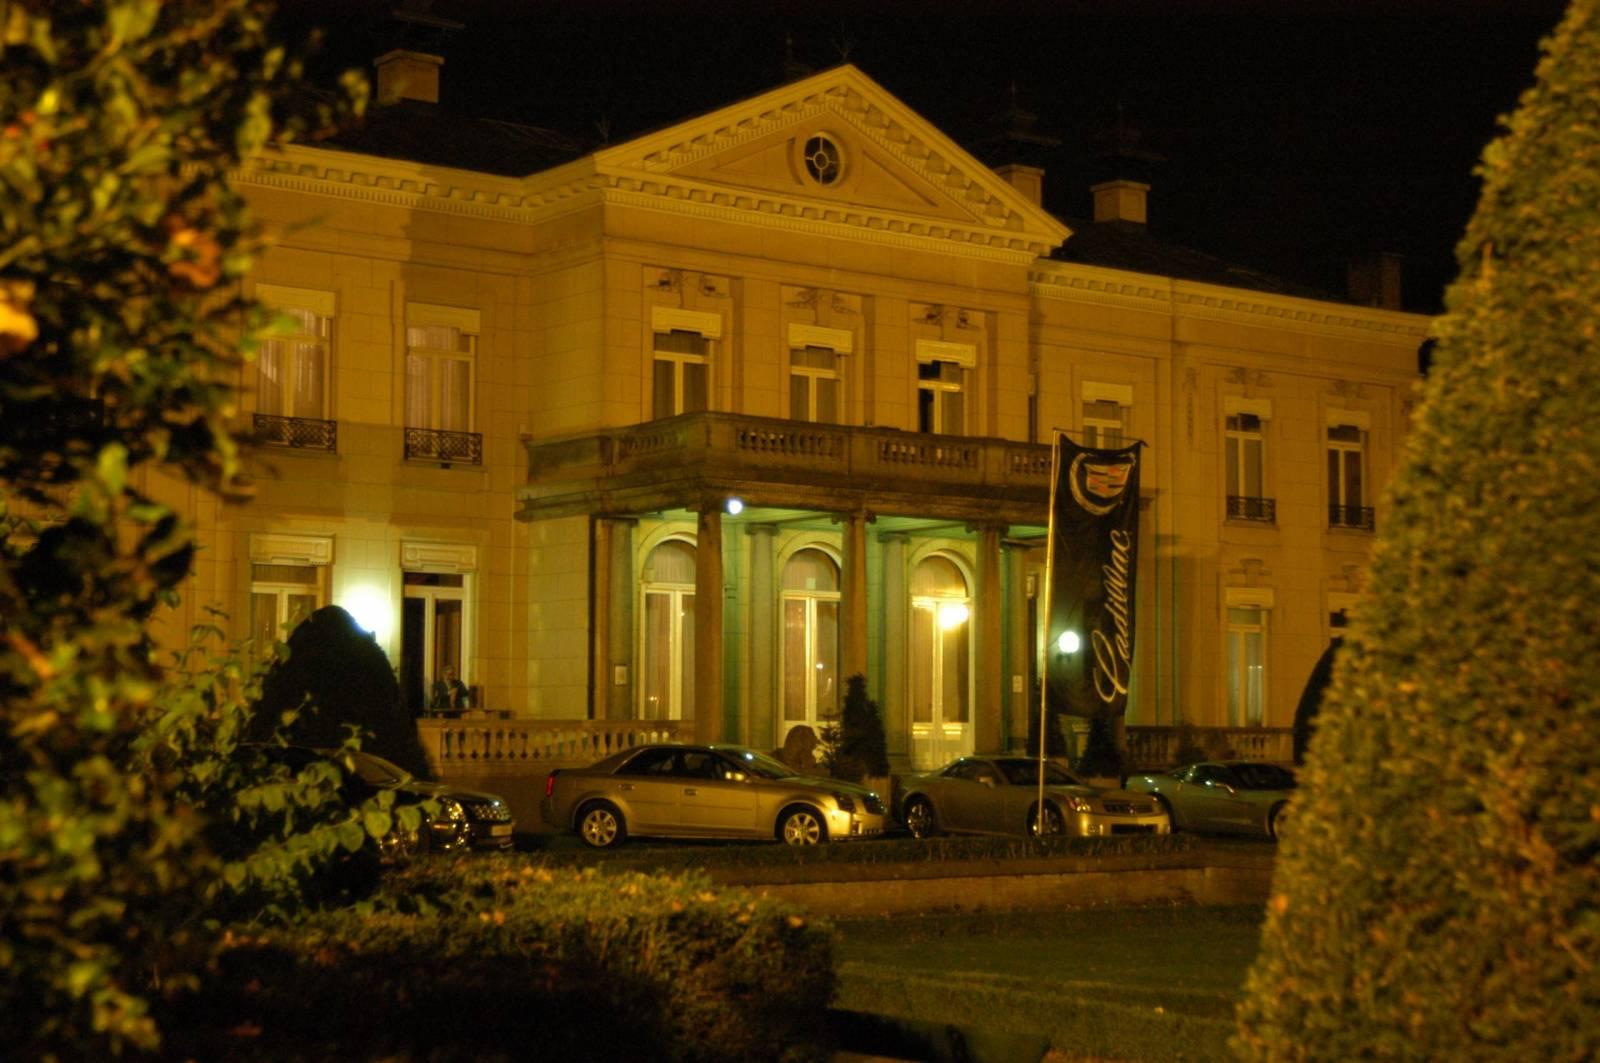 Kasteel Den Brandt - Feestzaal - Trouwzaal - Kasteel - House of Weddings - 13